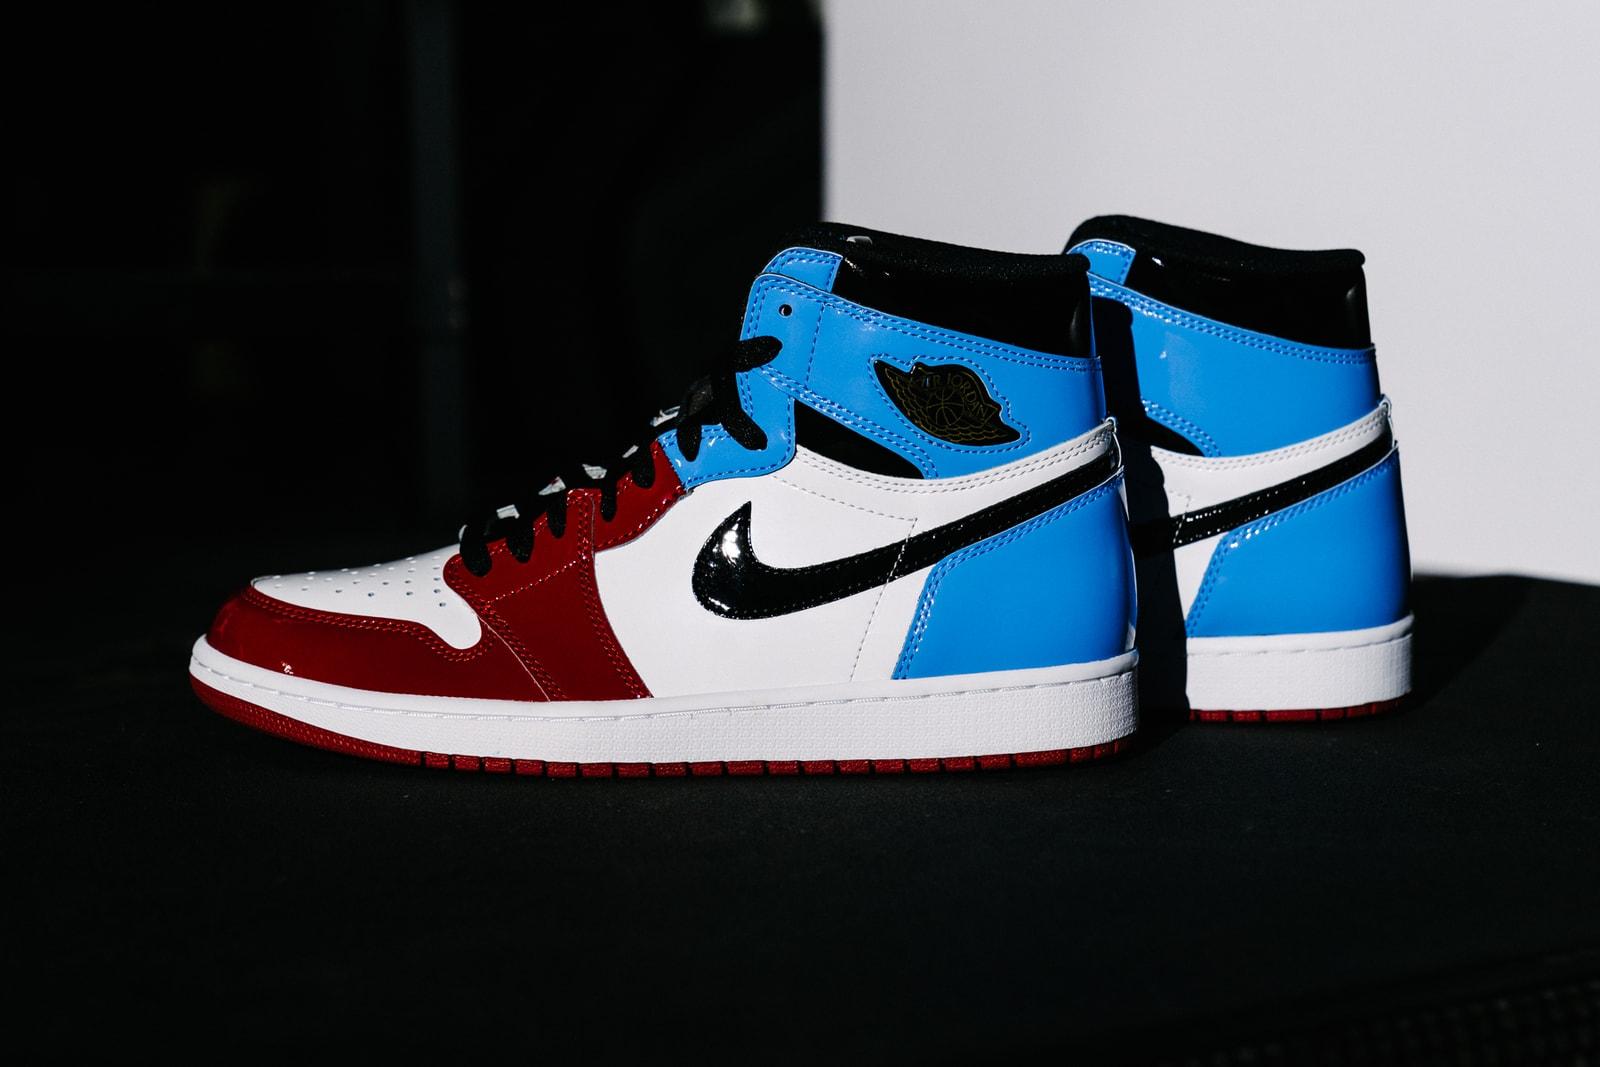 Nike Air Jordan 1 High